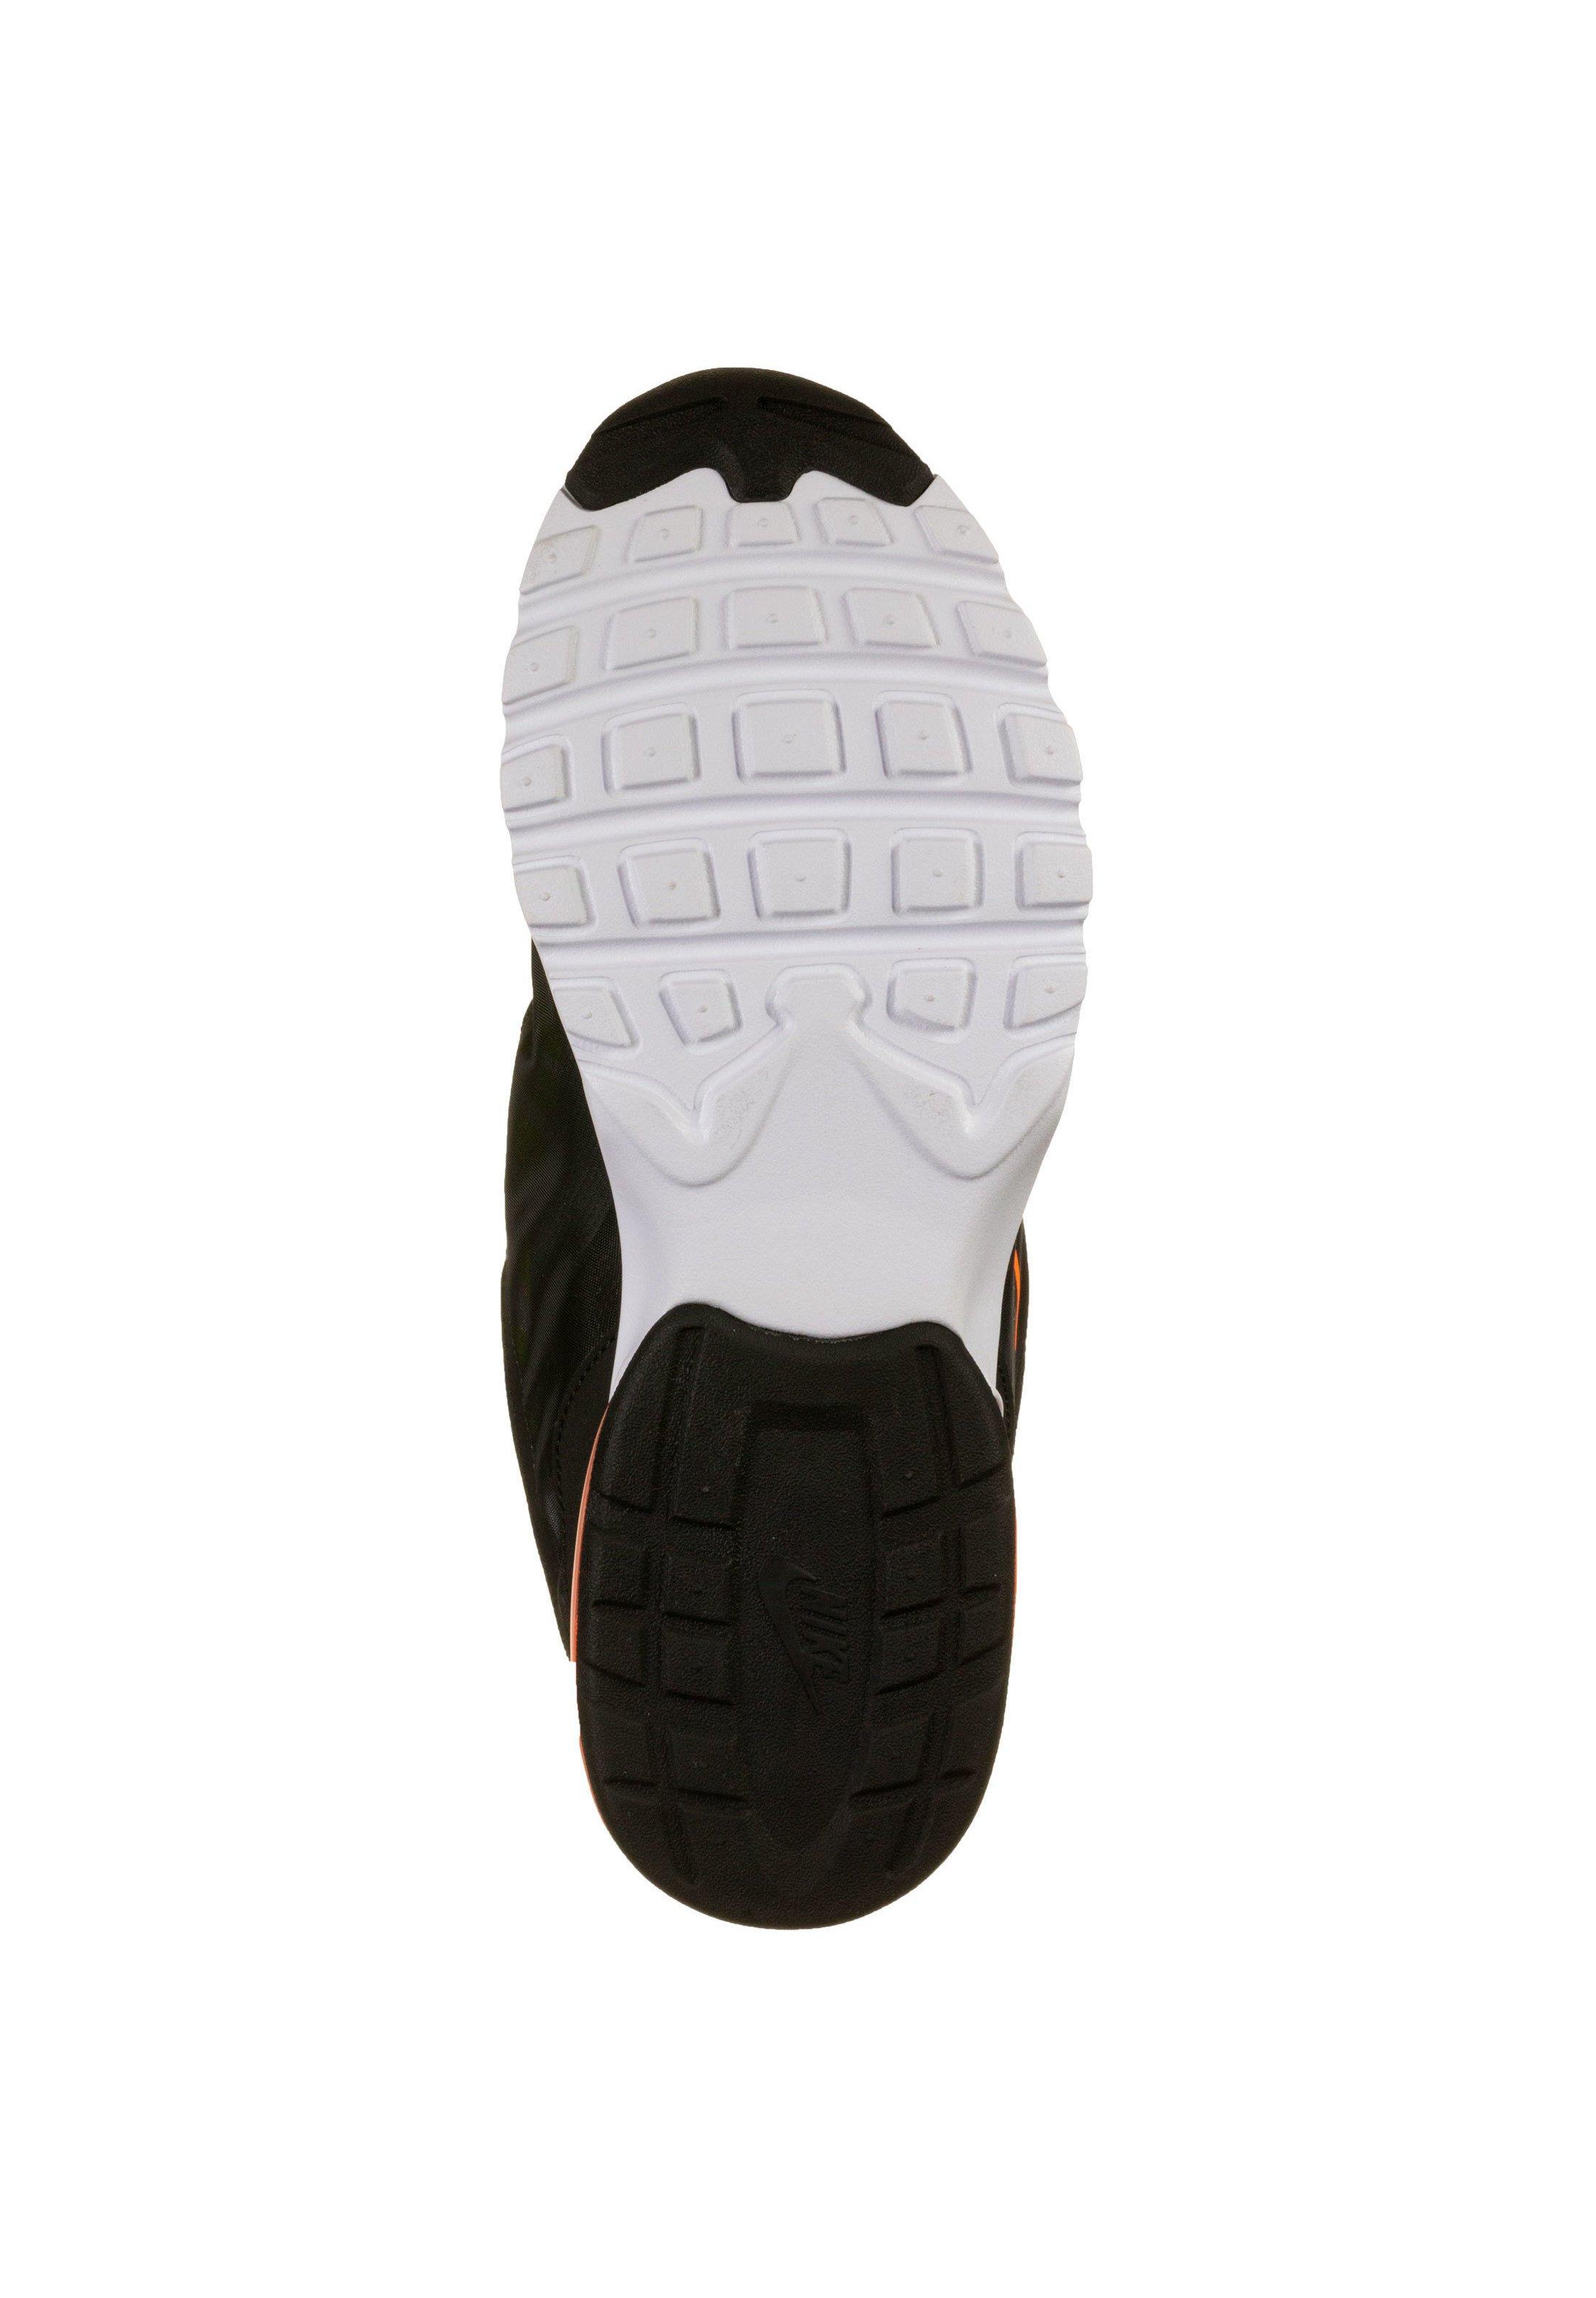 Nike Sportswear VG-R  - Sneaker low - white / total orange / anthracite / black/schwarz - Herrenschuhe O7nbW